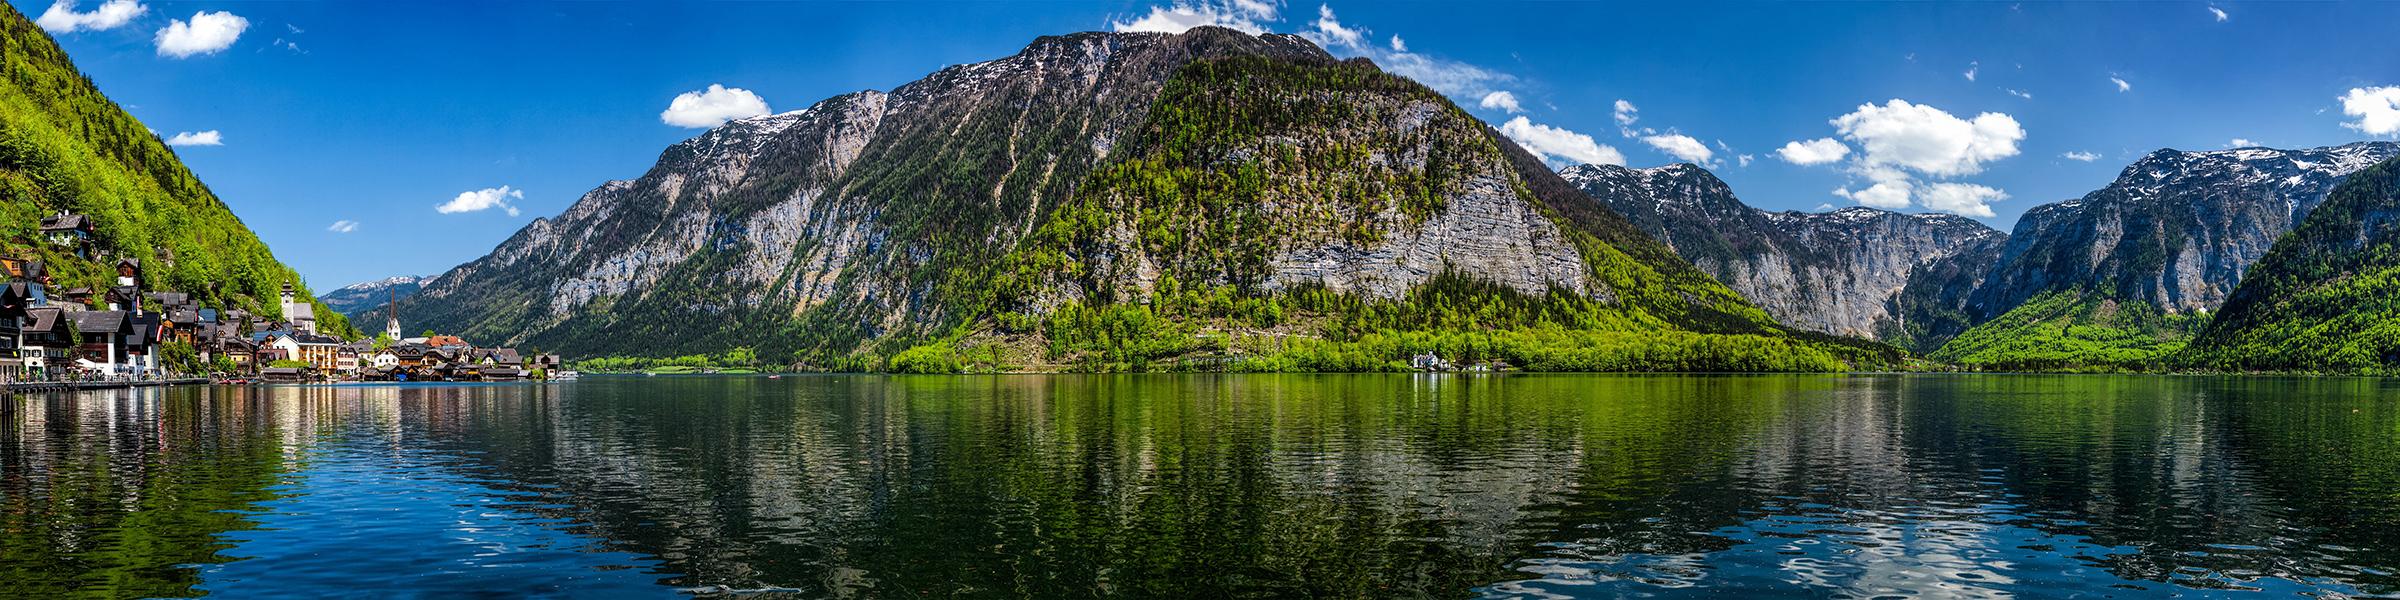 Austria Alps Lake Hallstatt